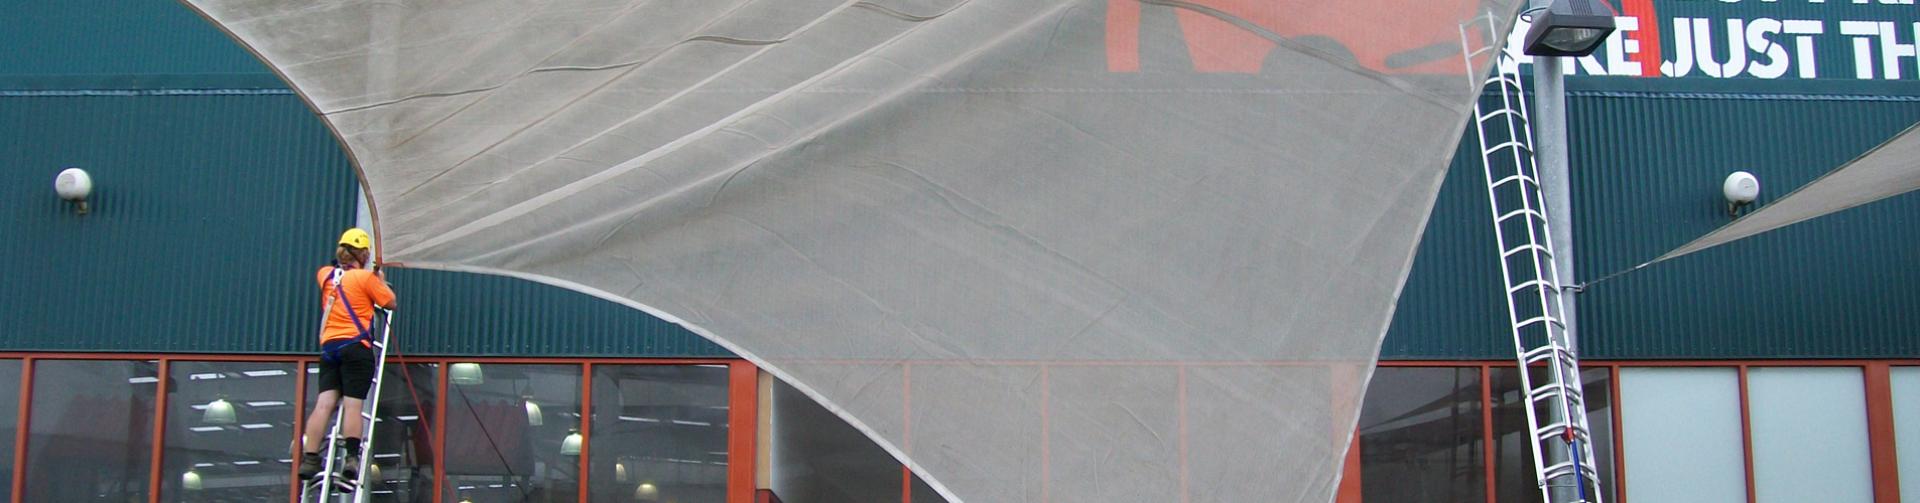 Banner Six